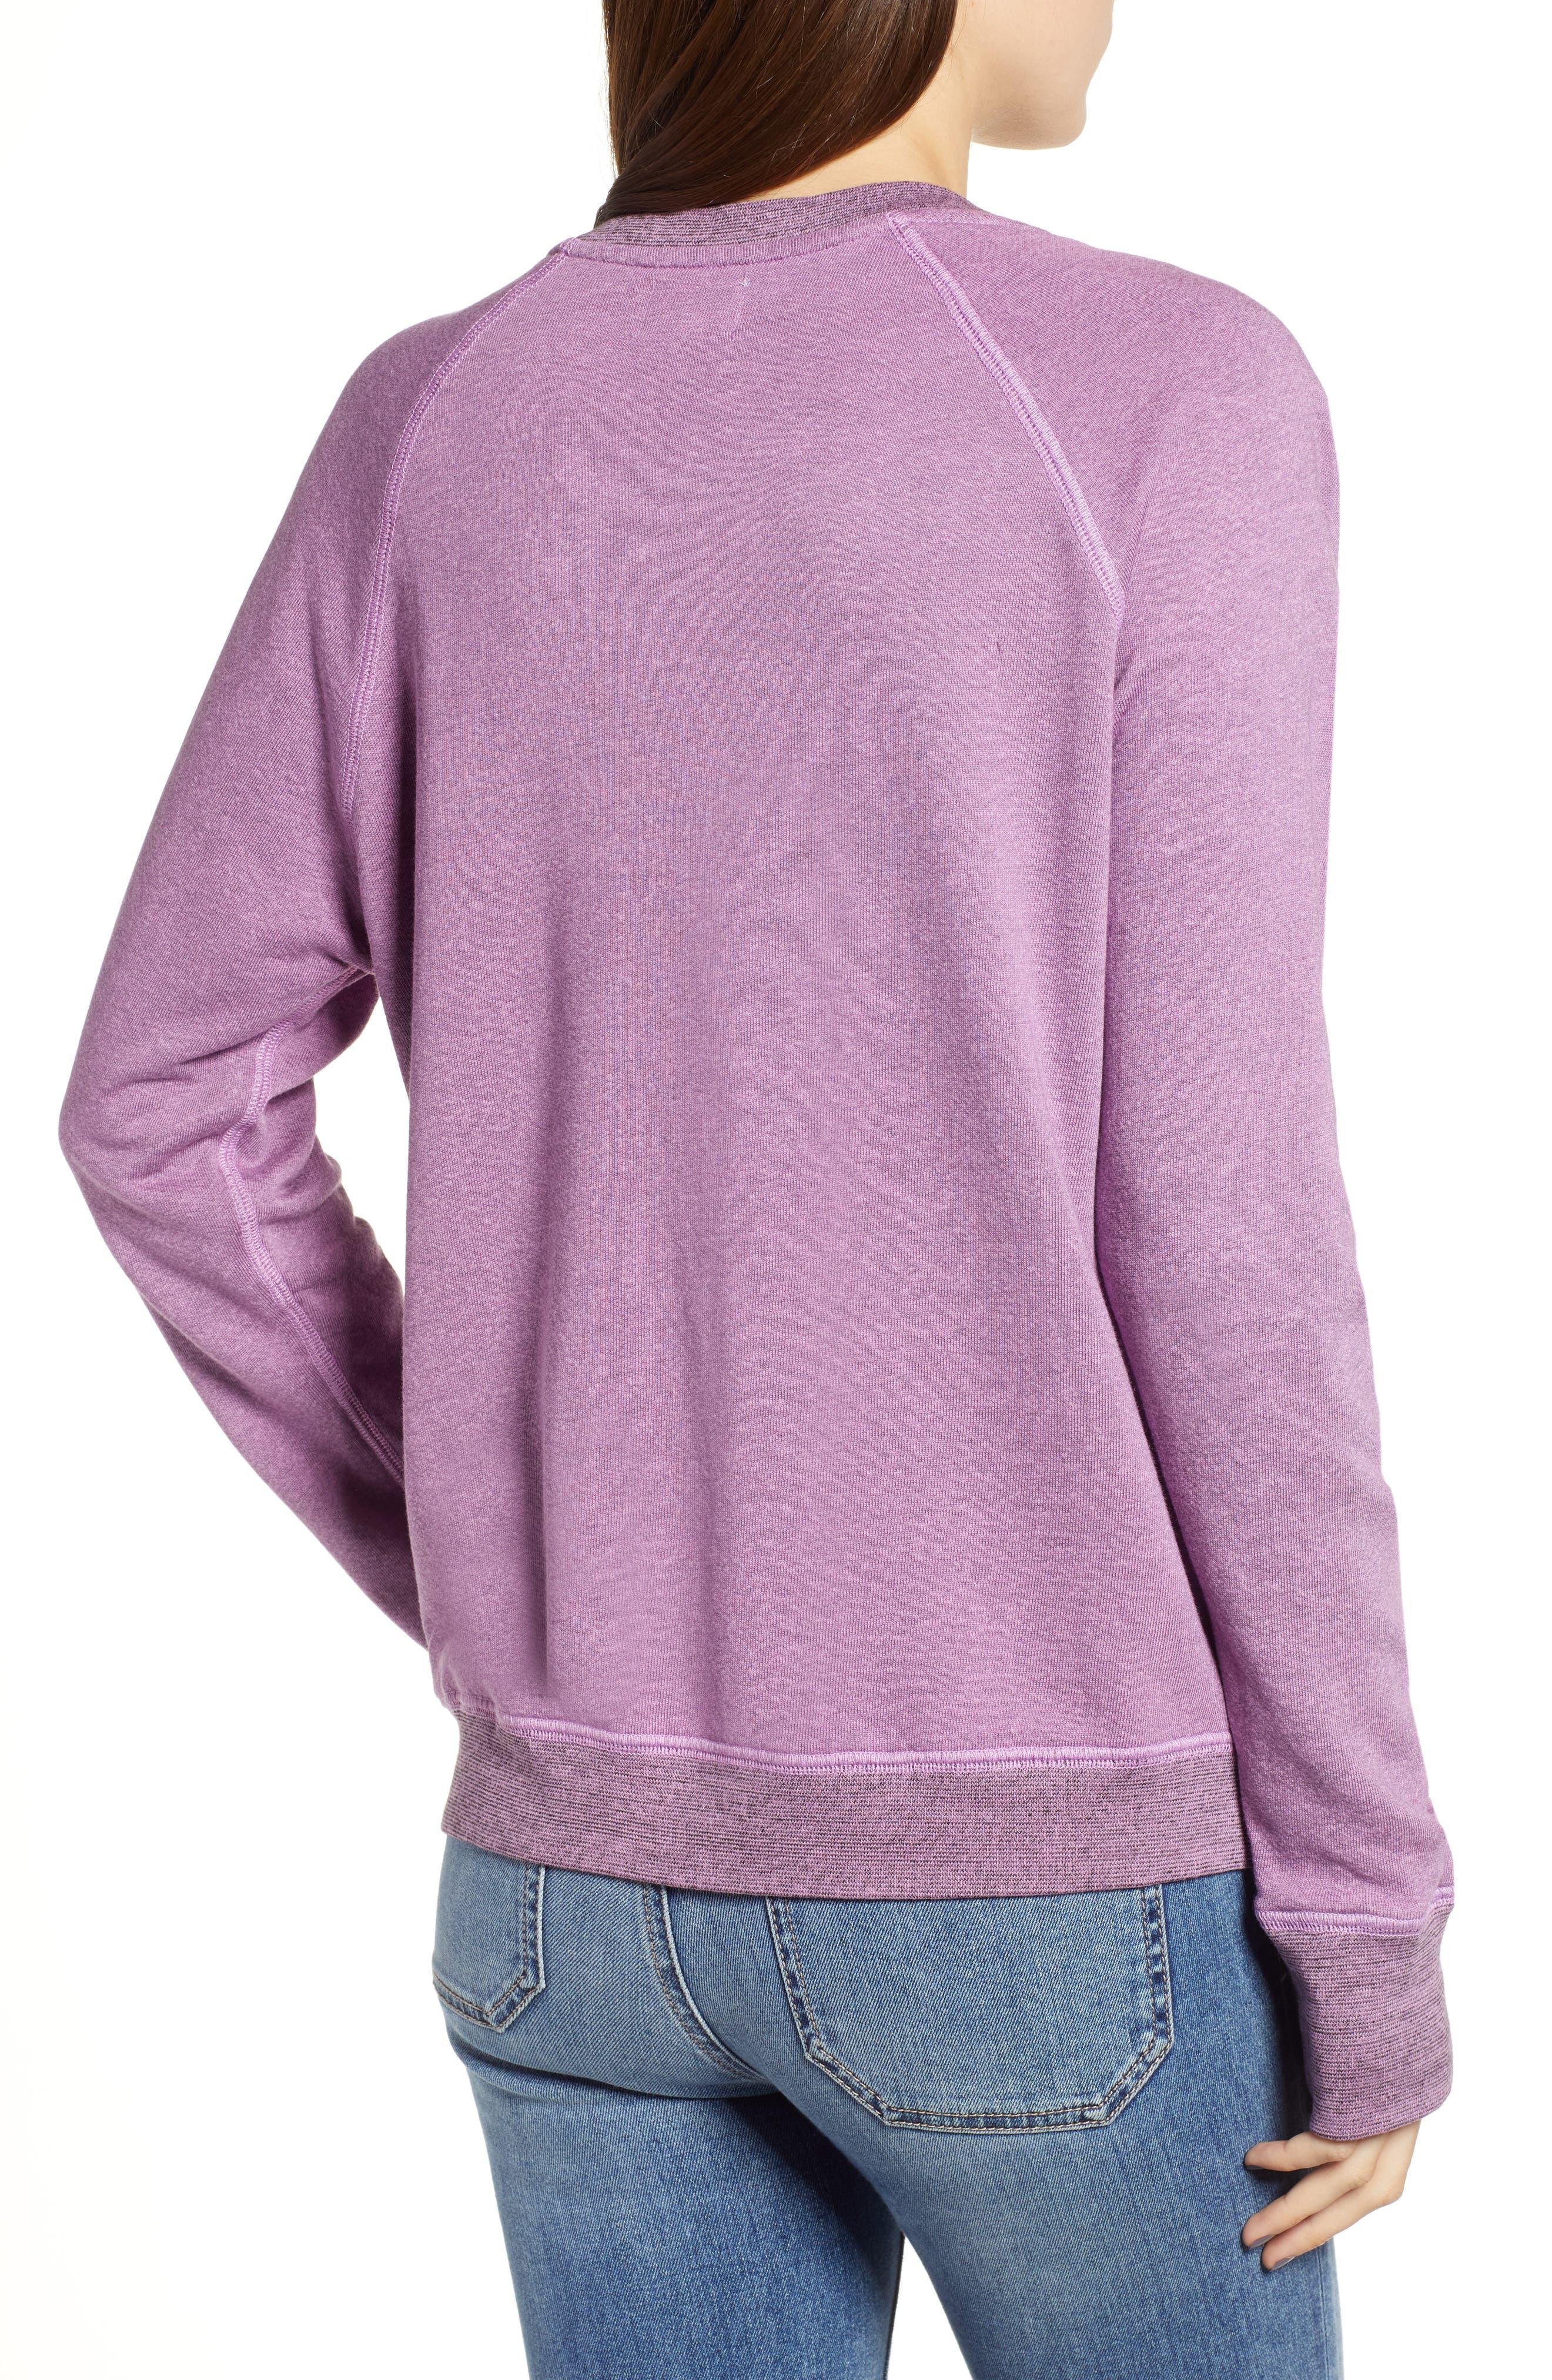 Faded Print Sweatshirt,                             Alternate thumbnail 2, color,                             525